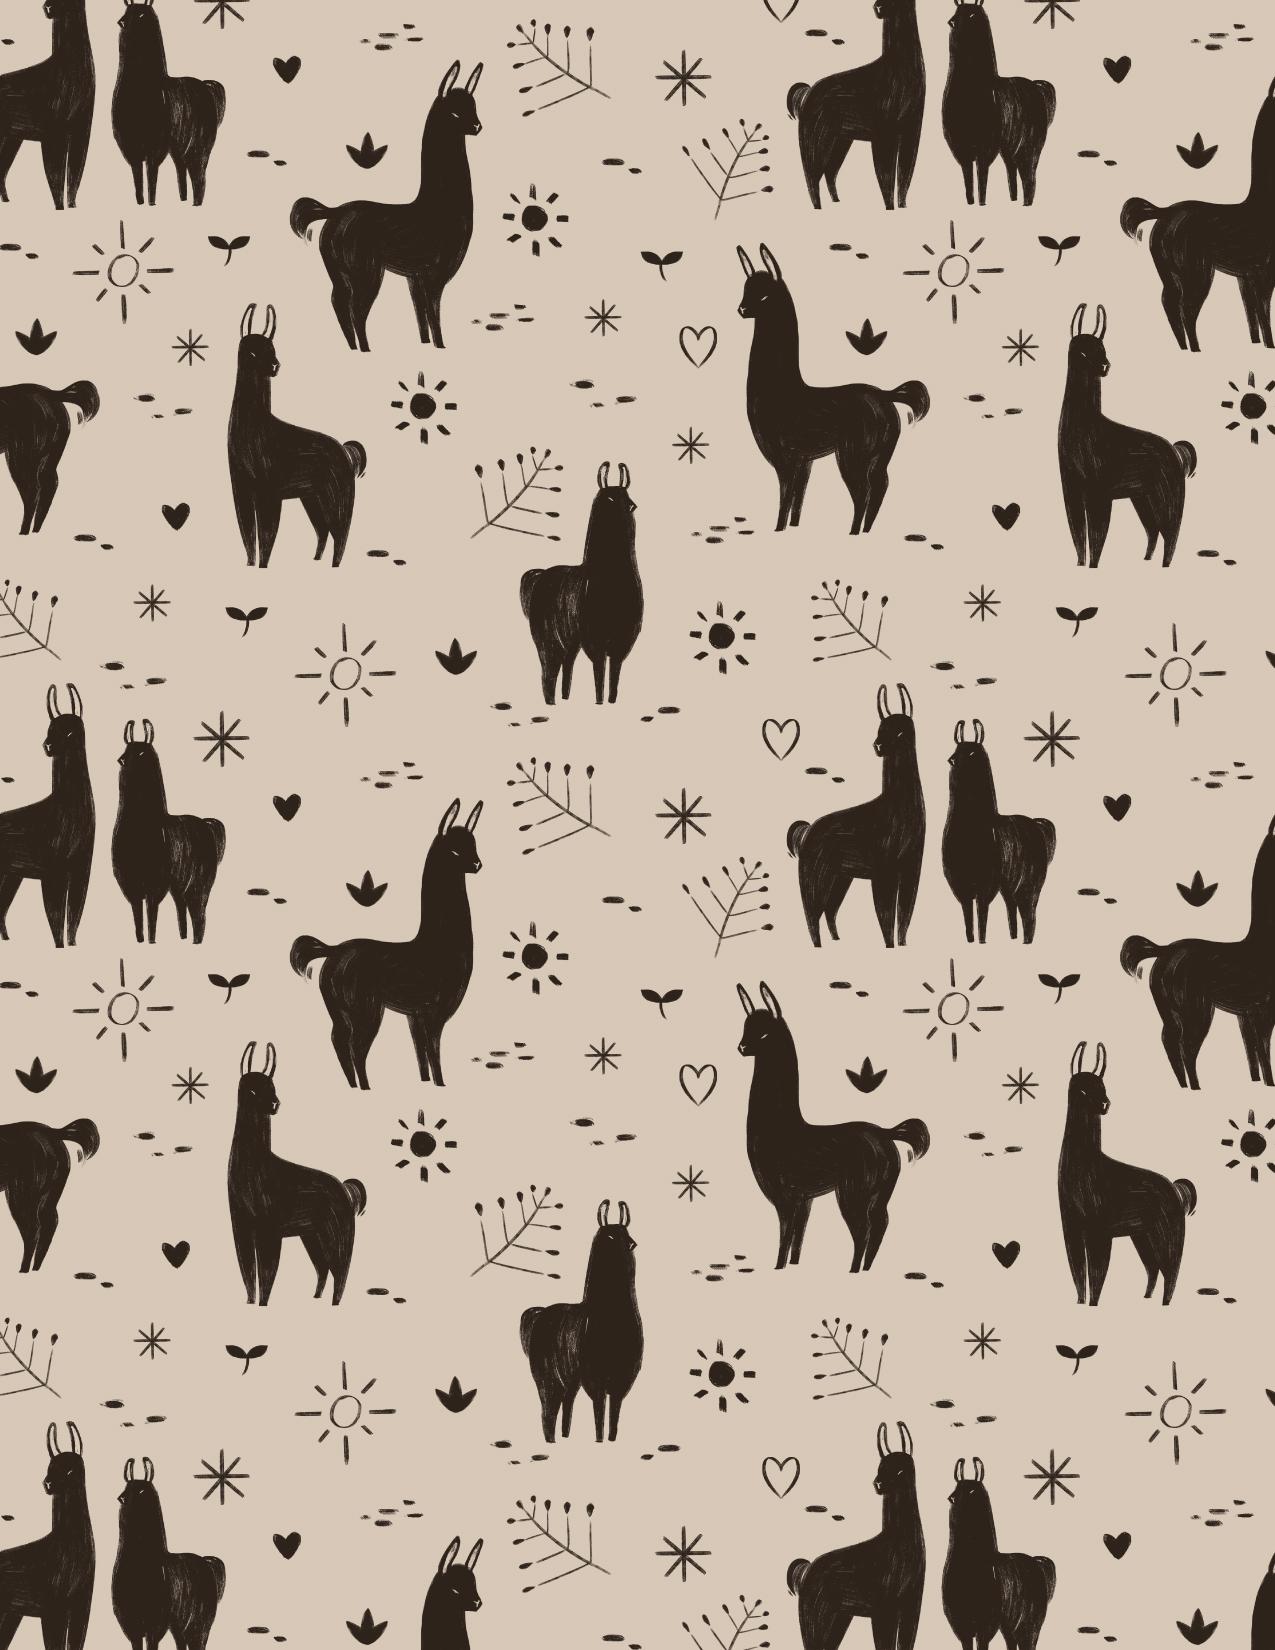 animal prints-01.jpg